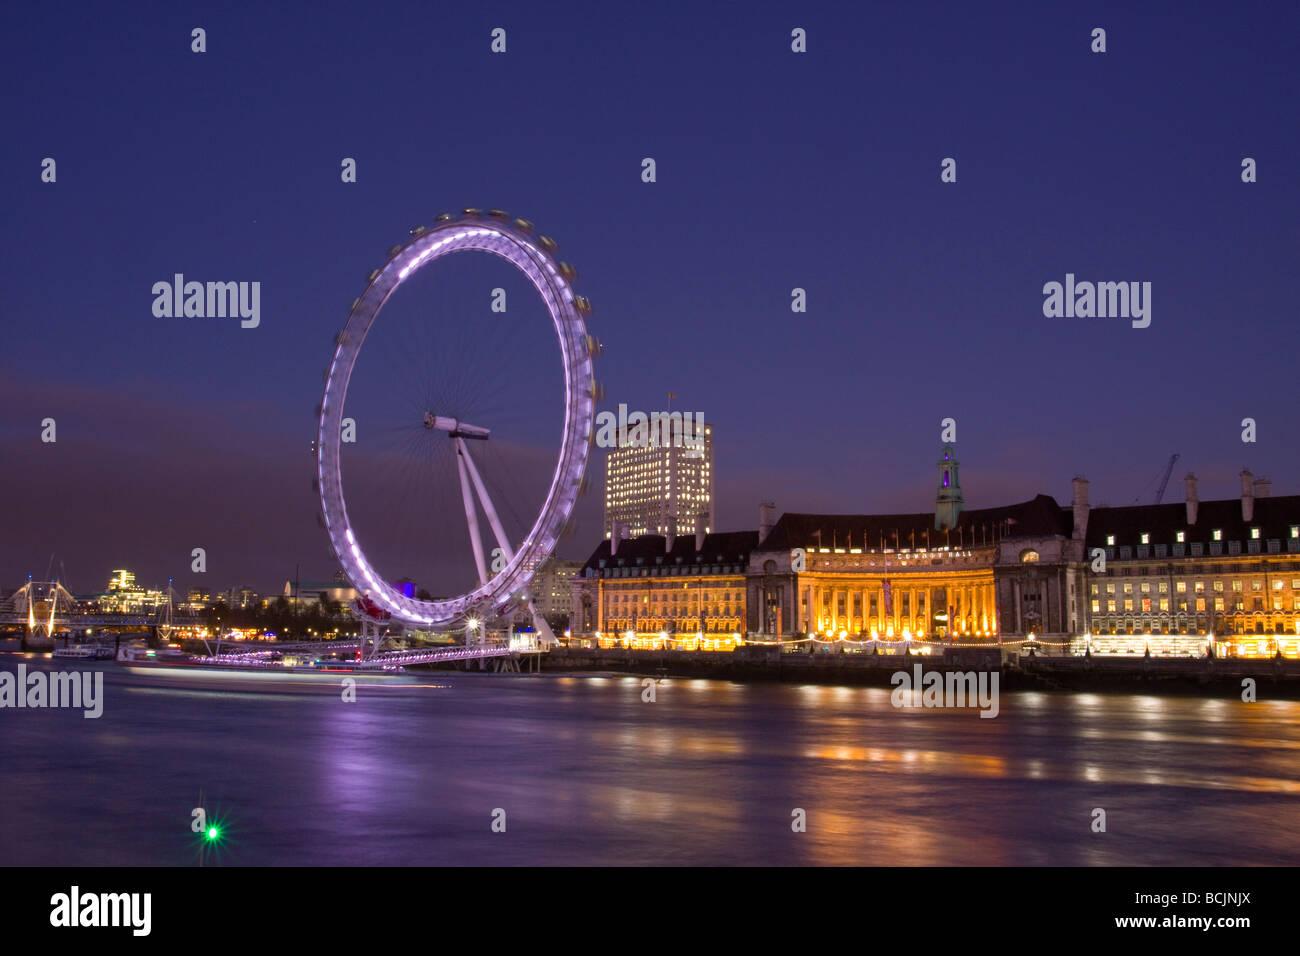 Millennium Wheel, London, England - Stock Image